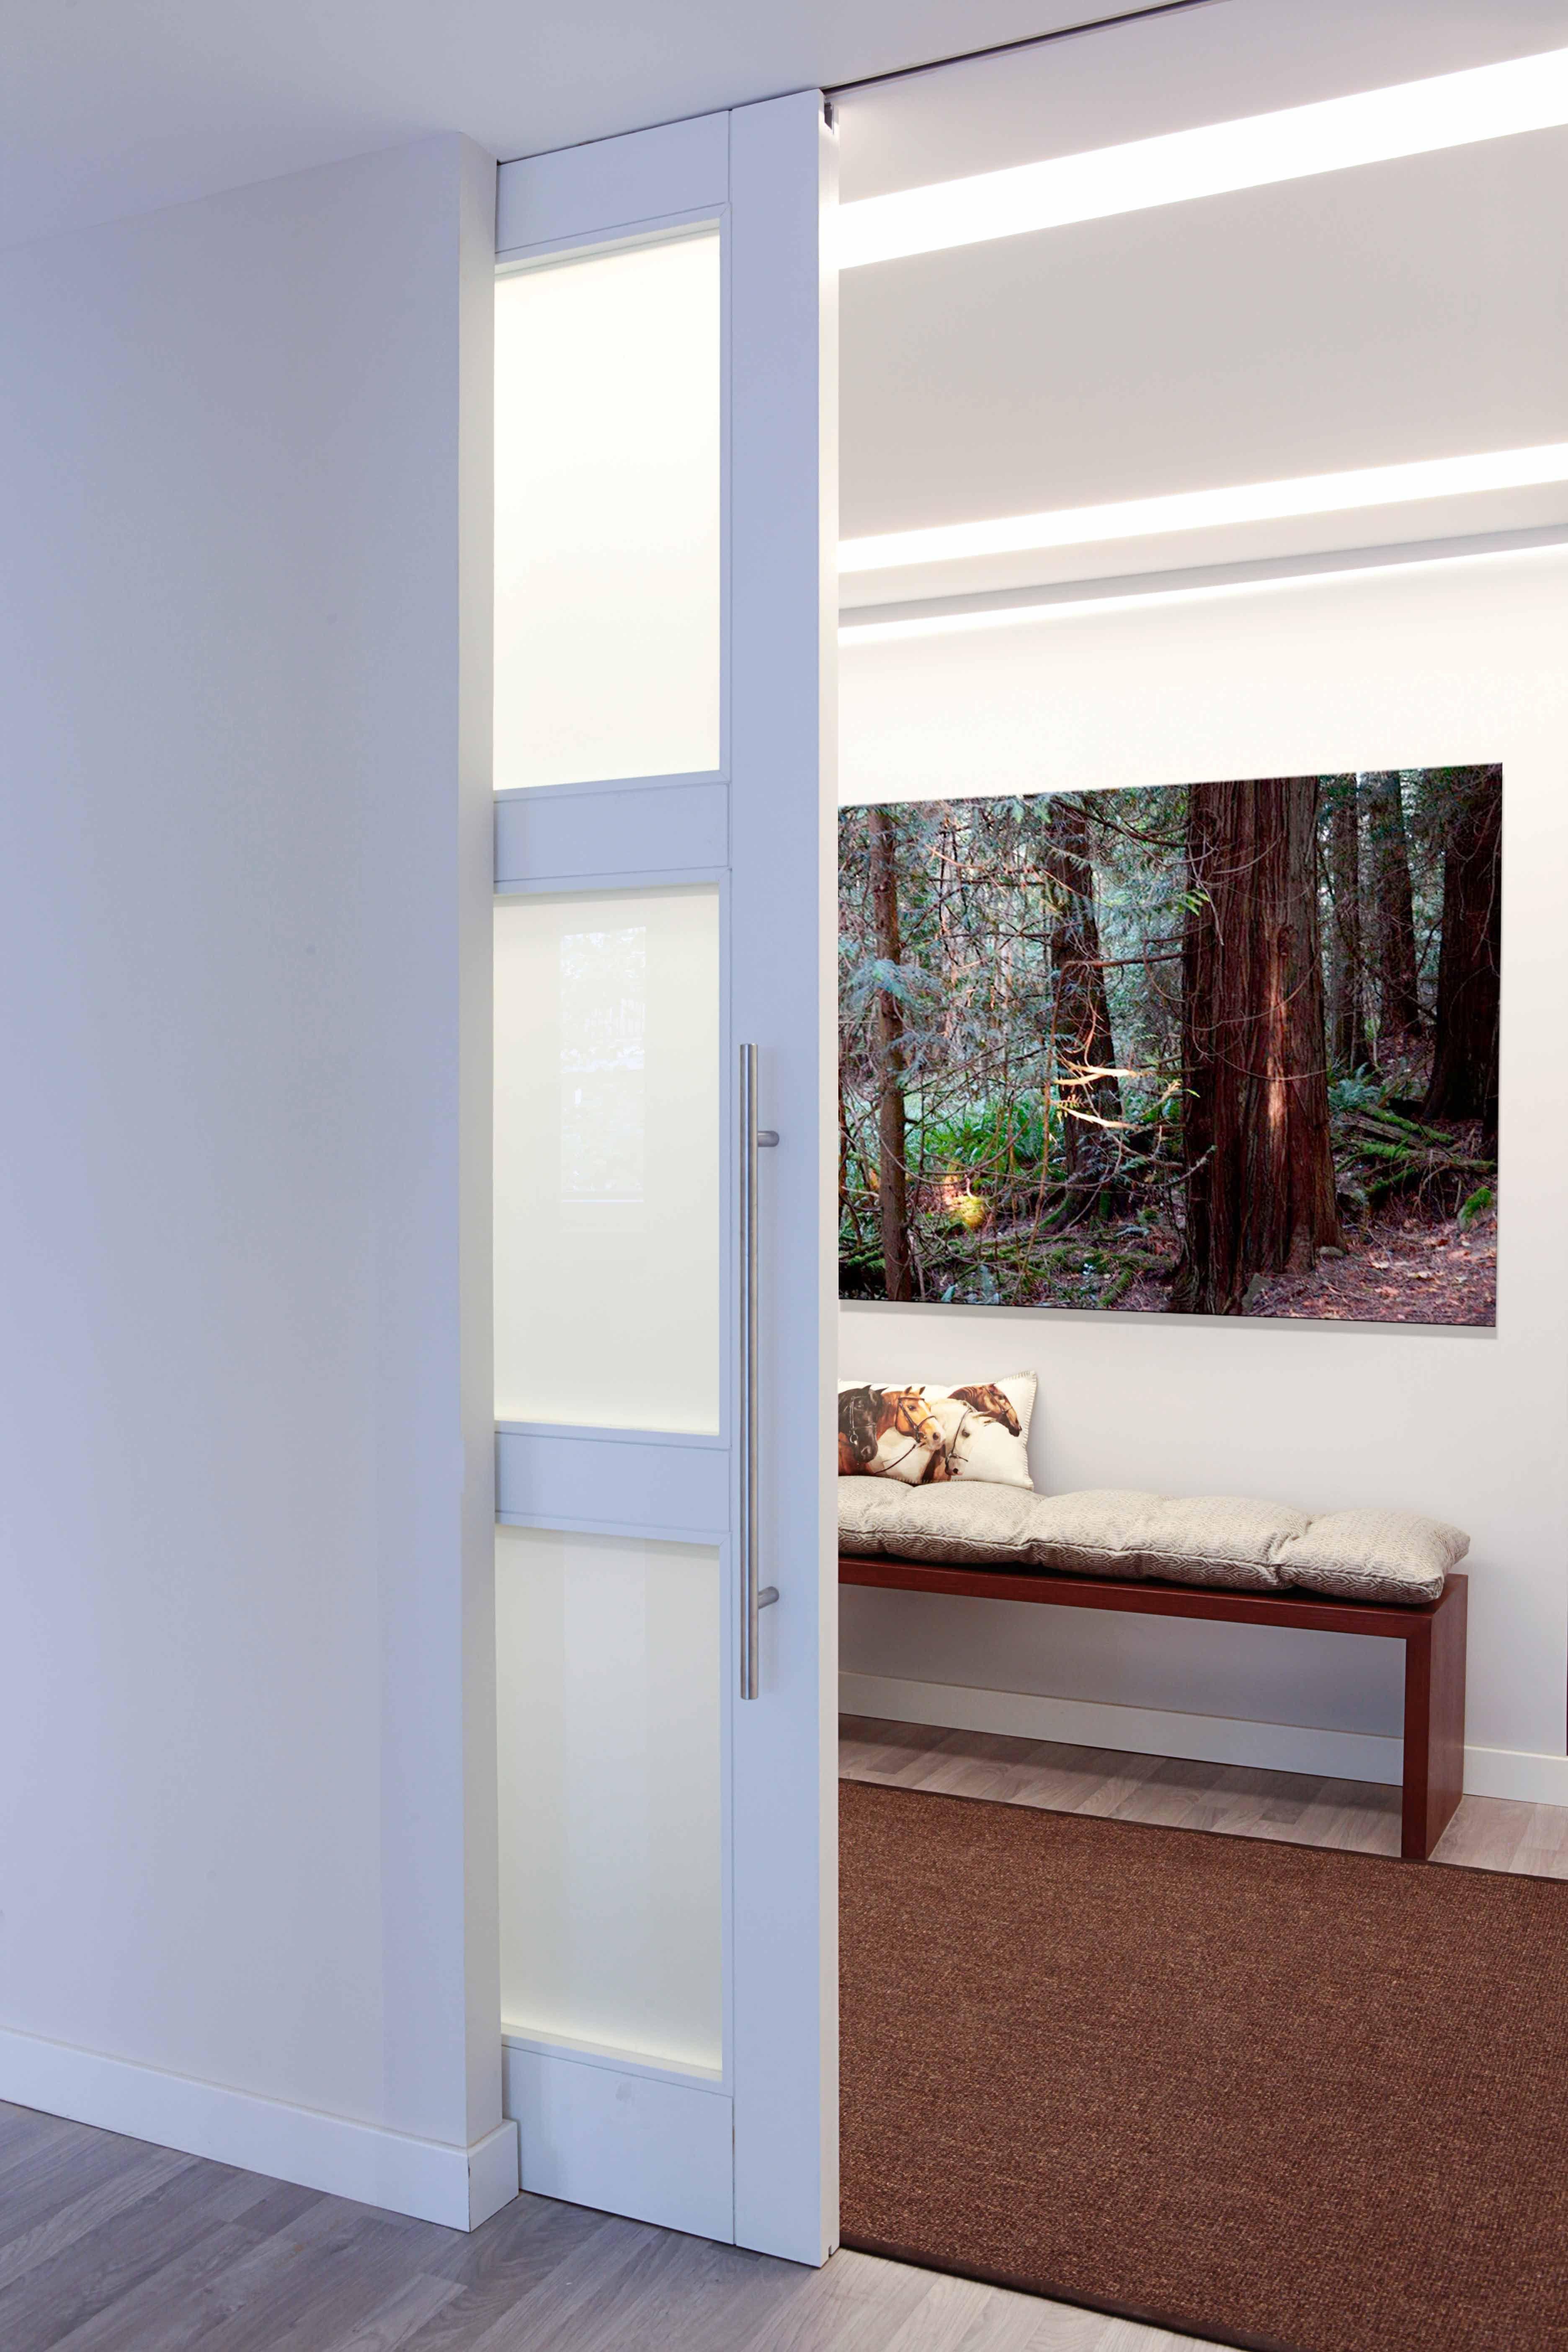 Puerta corredera de suelo a techo e iluminacion oculta en - Puerta corrediza para bano ...